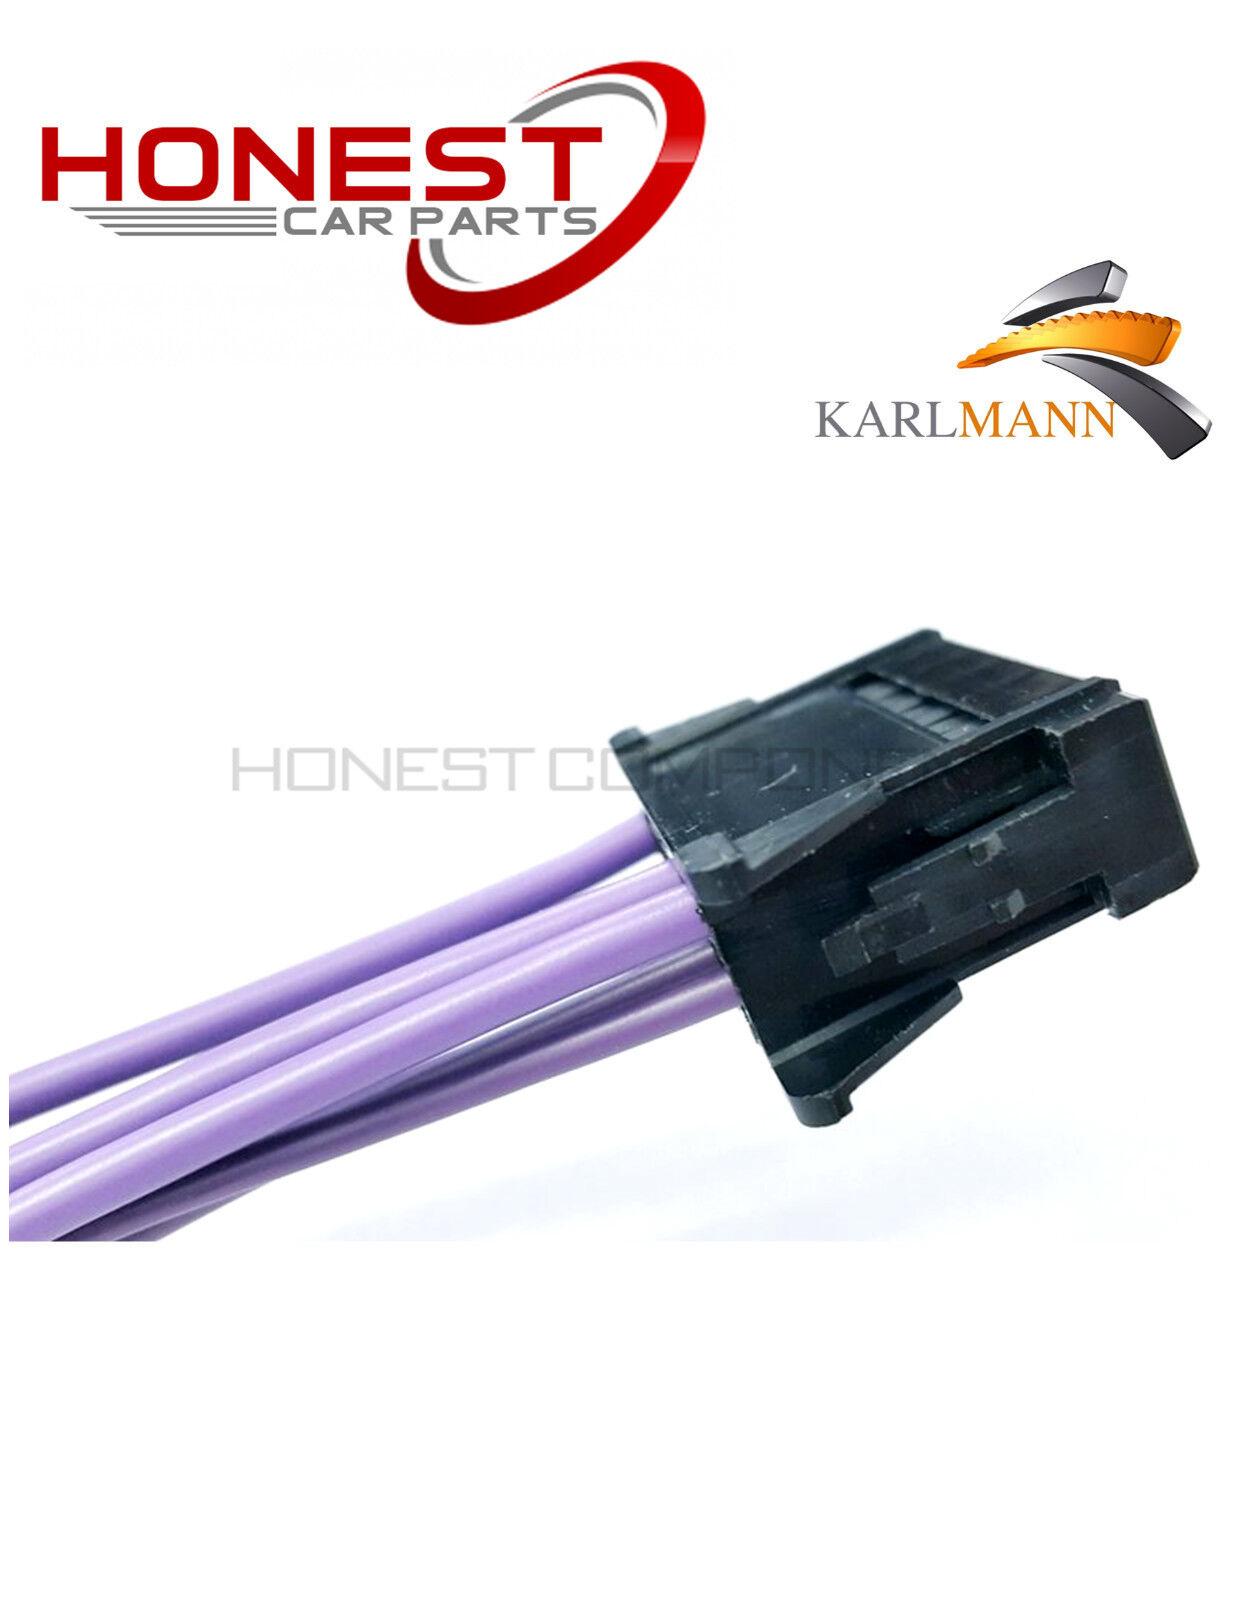 Repair Kit Renault Scenic 2 Megane Heater Blower Resistor Wiring Diagram Of 6 Loom Harness